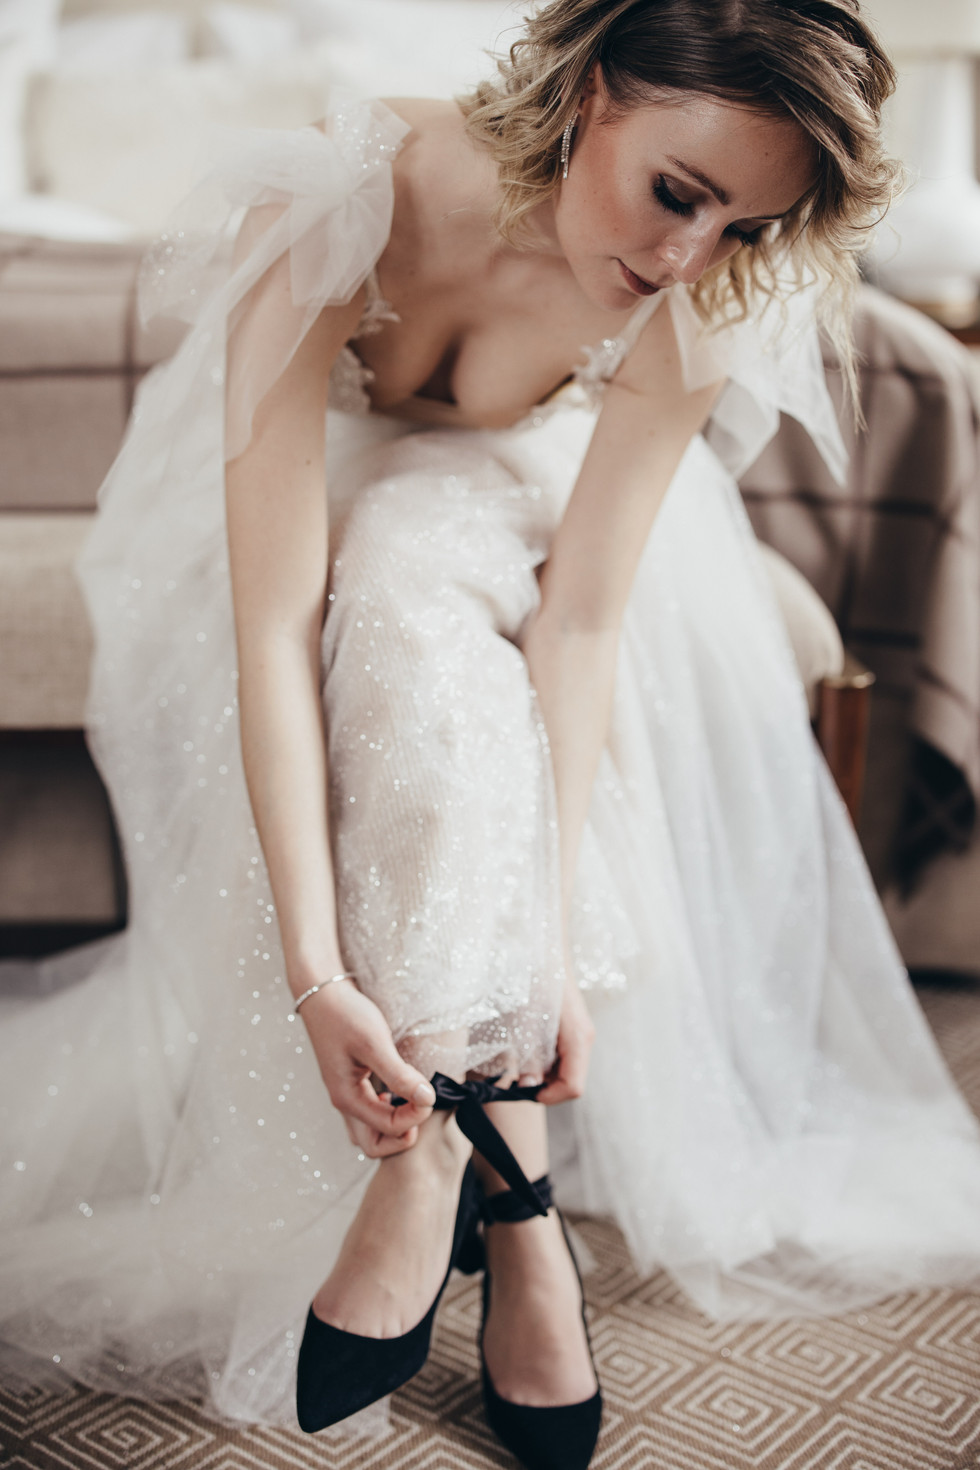 Photography & Planning: @maxwellartphotography & @melanie_munoz_photography & @ramu74  Bride: @ichbinjanine  Groom: @michaurfer  Floristic & Design: @karinmani.flowers.and.design  Hair & Makeup: @isabelle.hair.and.makeup  Wedding Stationary: @geistreichkalligrafie  Wedding Dresses: @bridalboutiquebadenbaden with @musebyberta  Suit: @mannesach  Wedding Decor: @vonrock.de  Silk Ribbons: @silkdreamsboutique  Hotel / Location: @kulmhotel  Shoes: @emmylondonofficial  Jewellery & Watches: @bucherer & @buchererfinejewellery